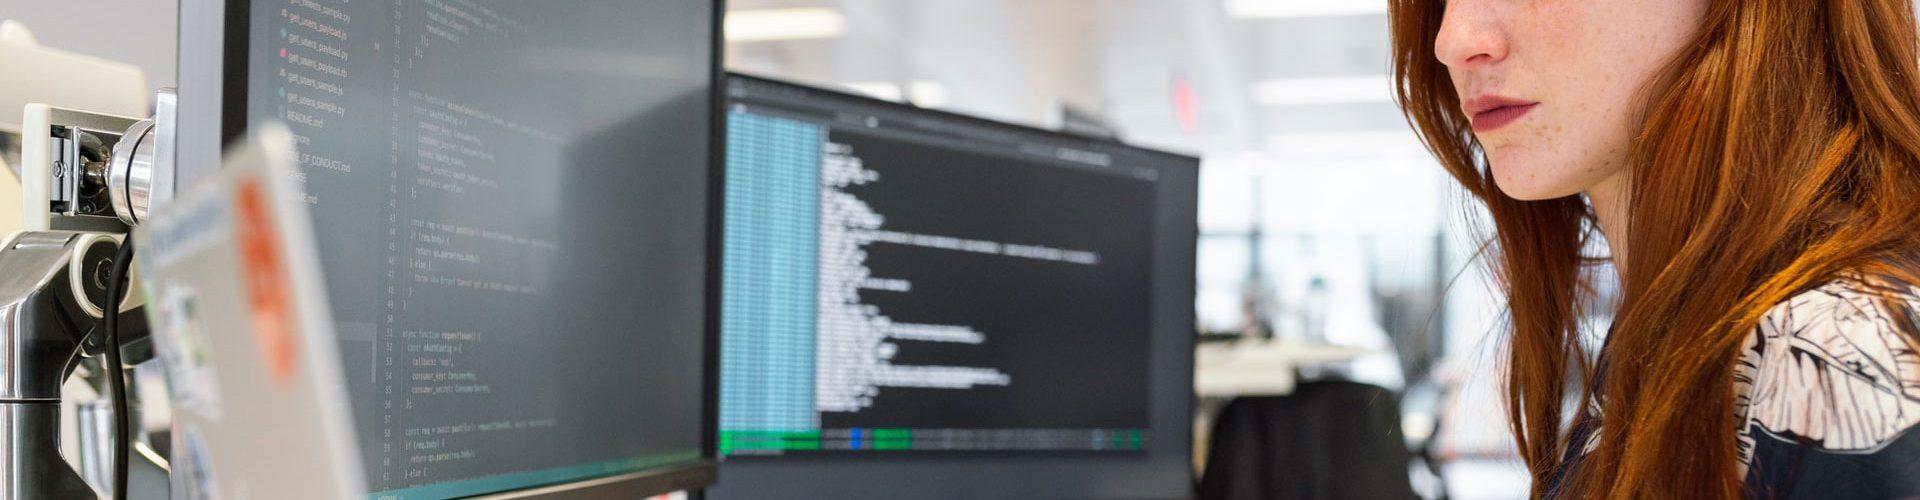 softwareengineering2_jason_dent_unsplash